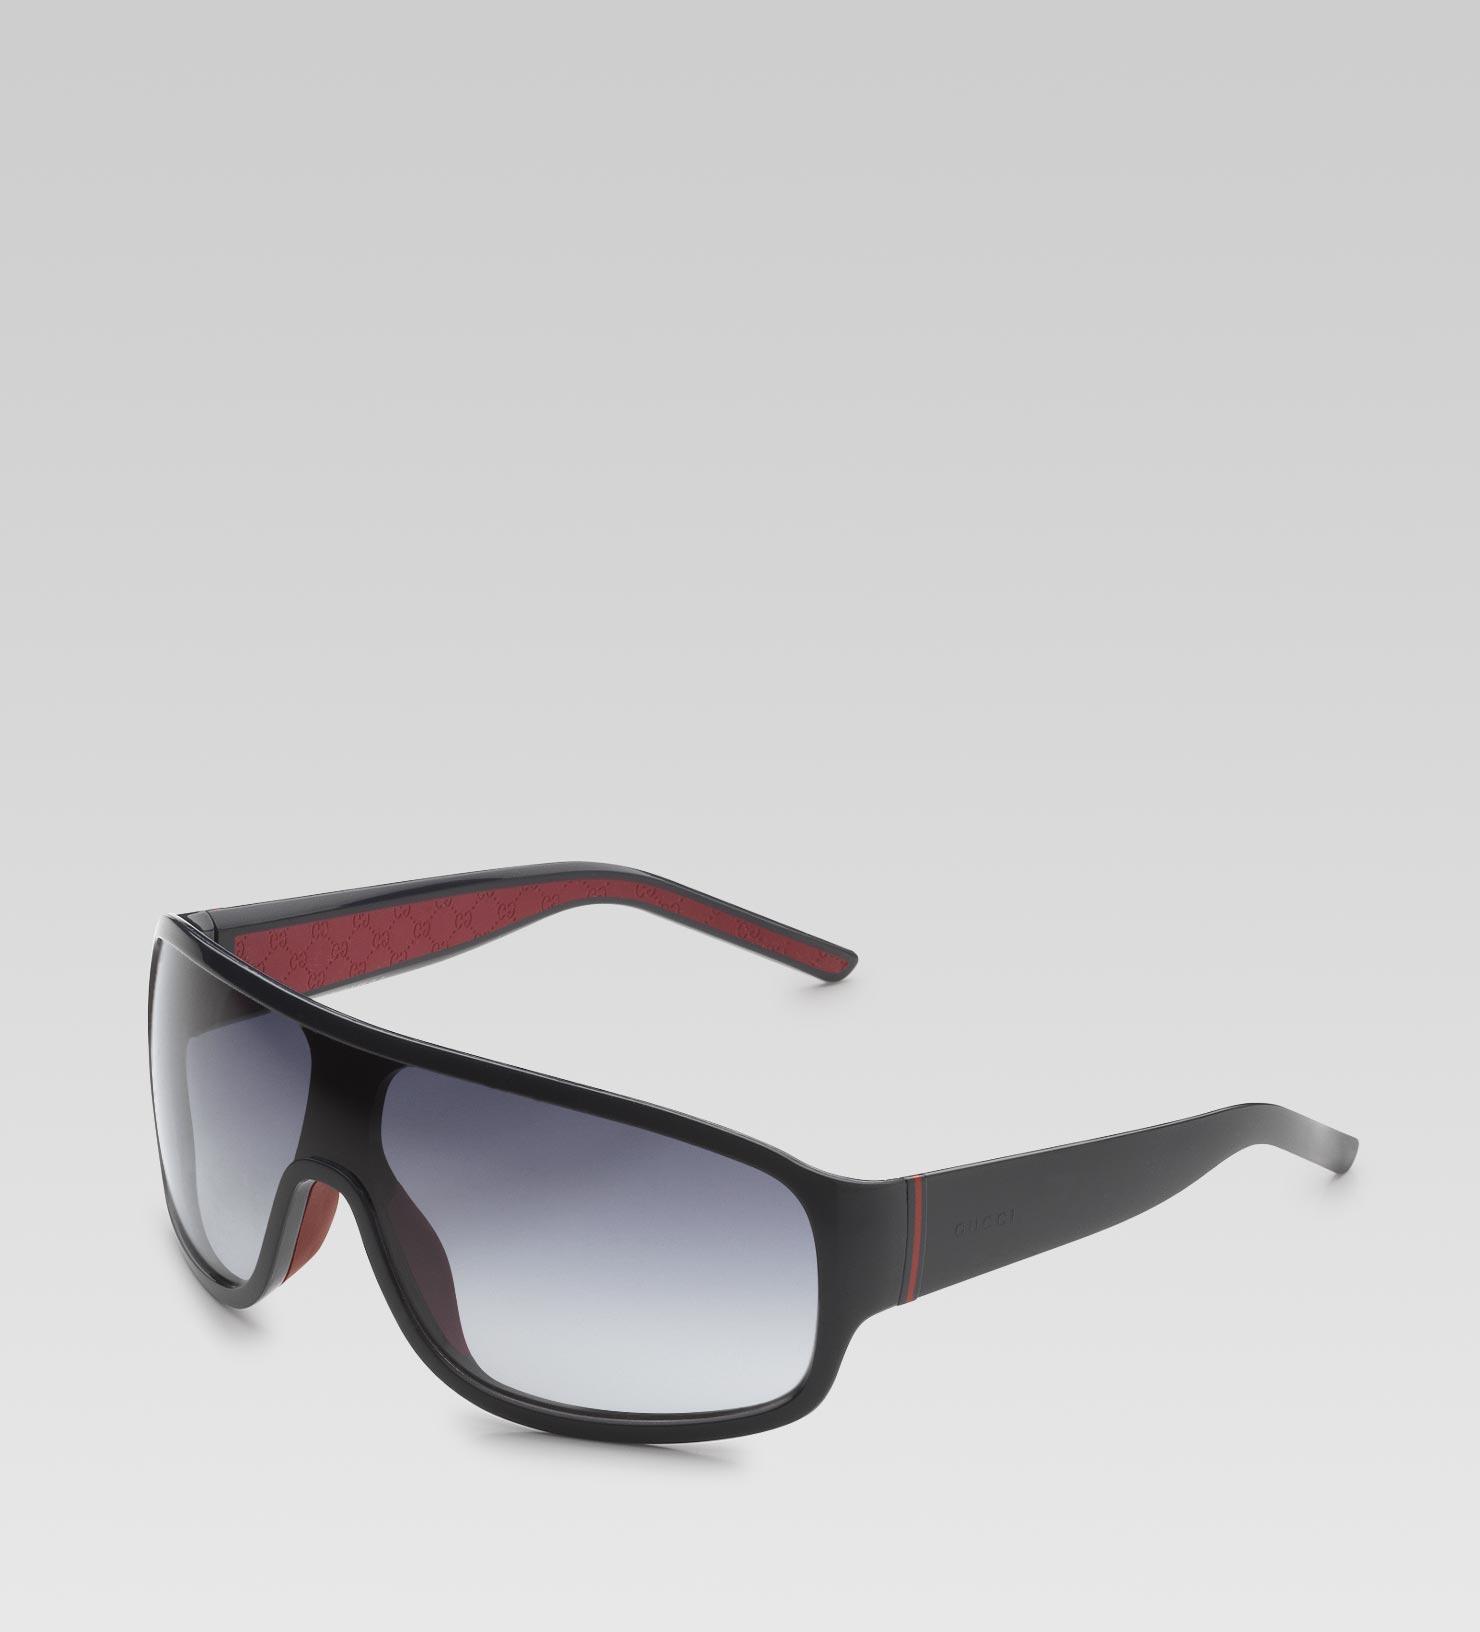 fc2a6ce6139 Gucci Medium Rectangle Mask Sunglasses with Gucci Logo and Web ...